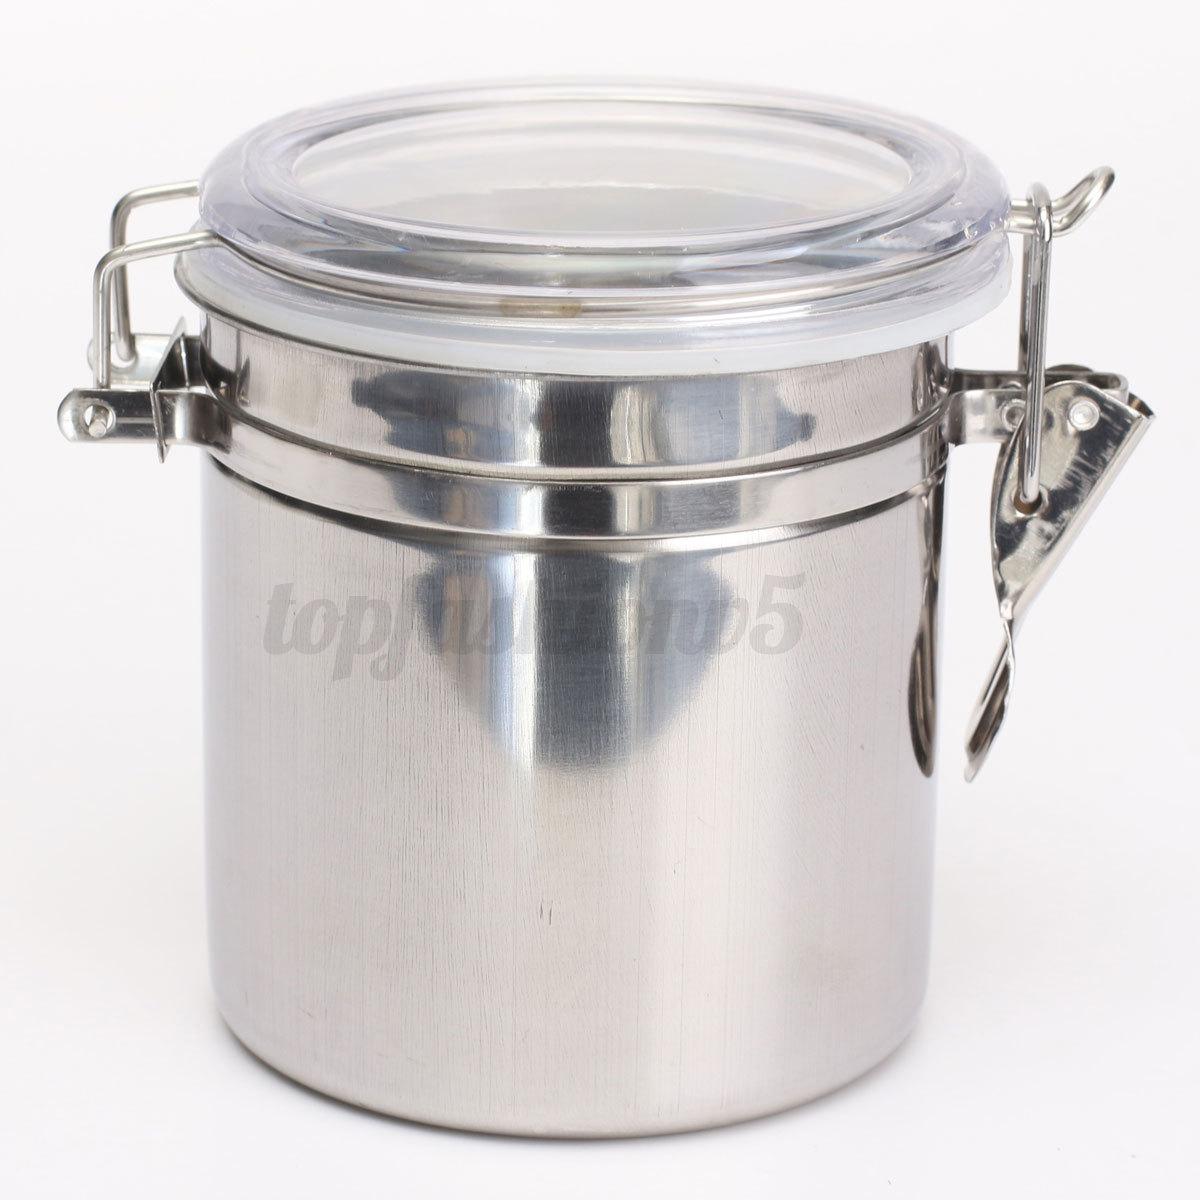 Barattoli cucina offerte e risparmia su ondausu - Barattoli pasta cucina ...